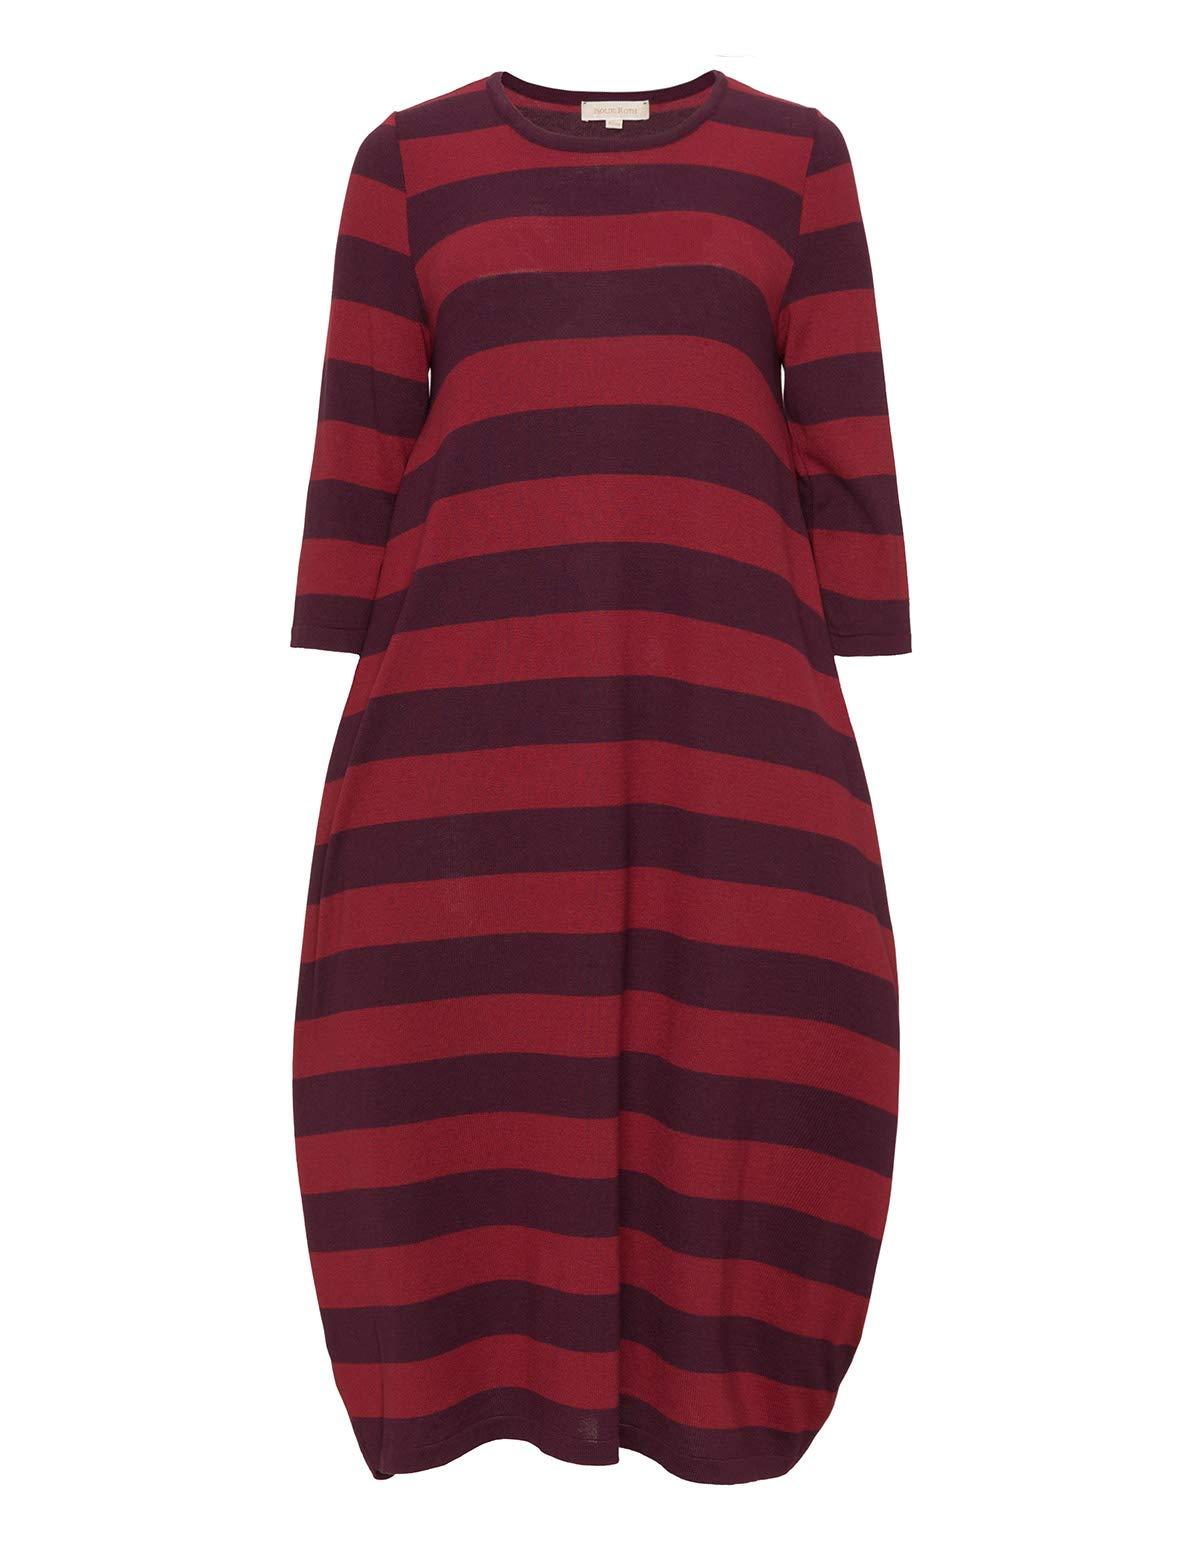 Isolde Roth Plus Size Dress Klara Knitted Striped Bubble Dress - Knee Length - Ladies - Women - Casual - navabi - Dark Purple and Dark red - US Size 10-12 Plus